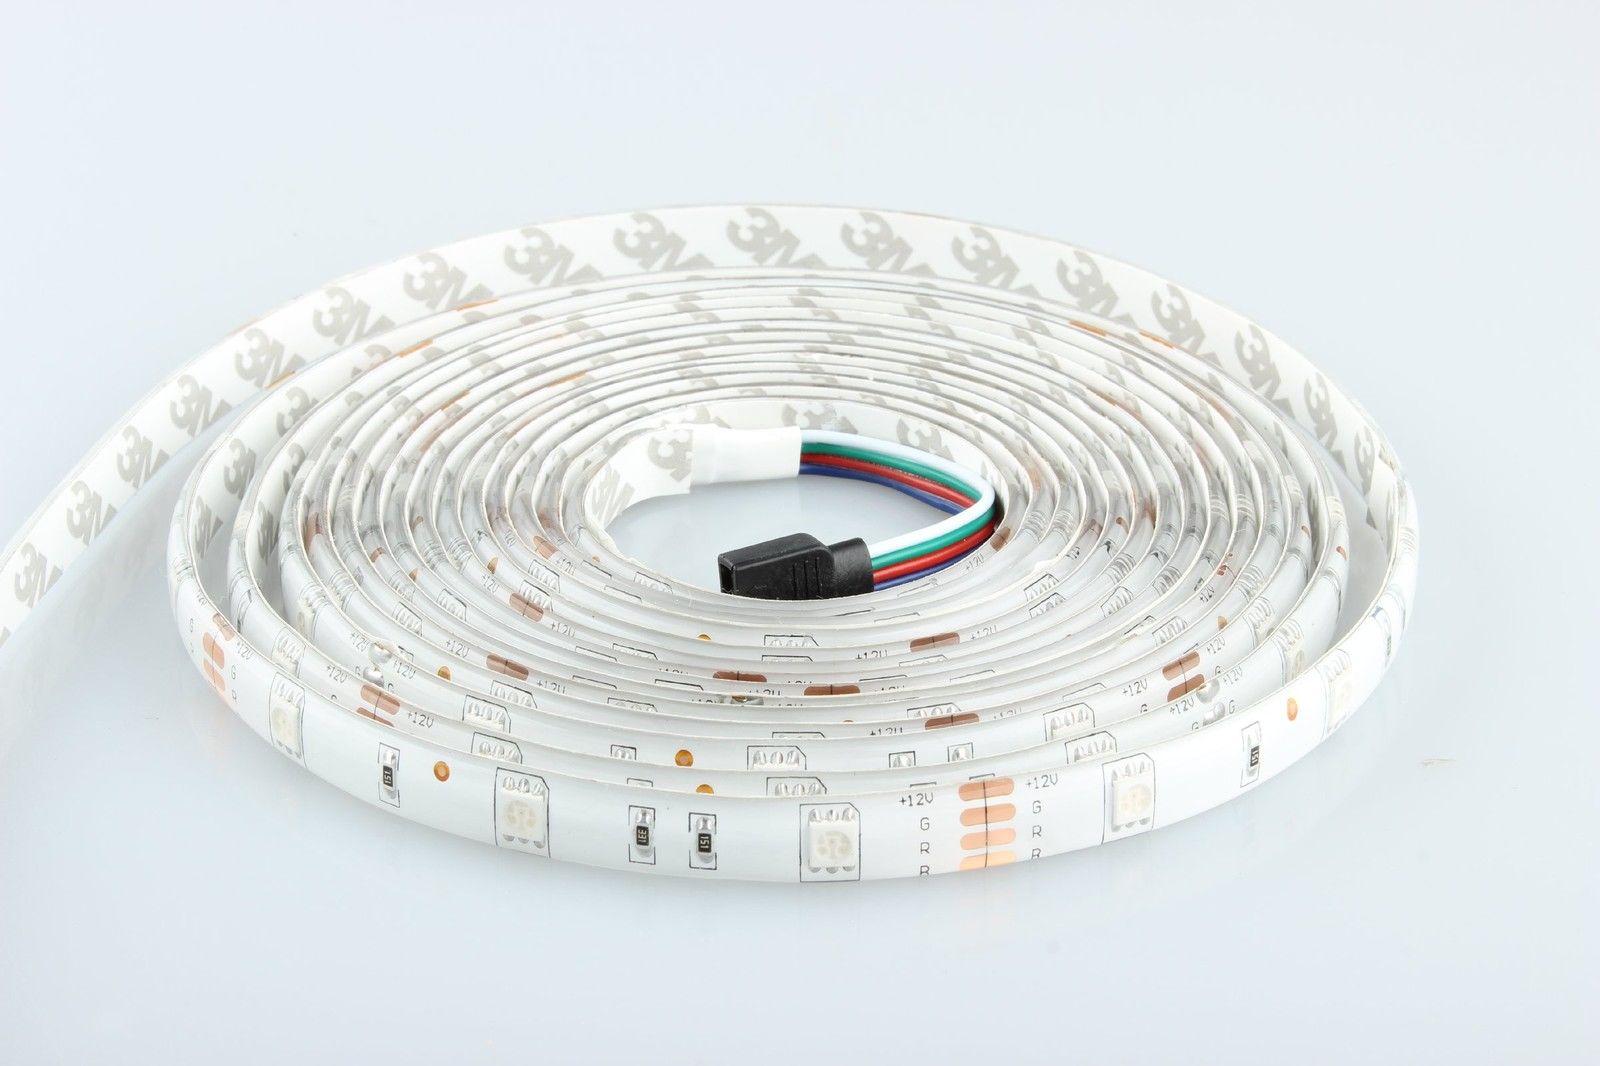 ninetec flash30 5m led strip band mit 30 hochleistungs led. Black Bedroom Furniture Sets. Home Design Ideas